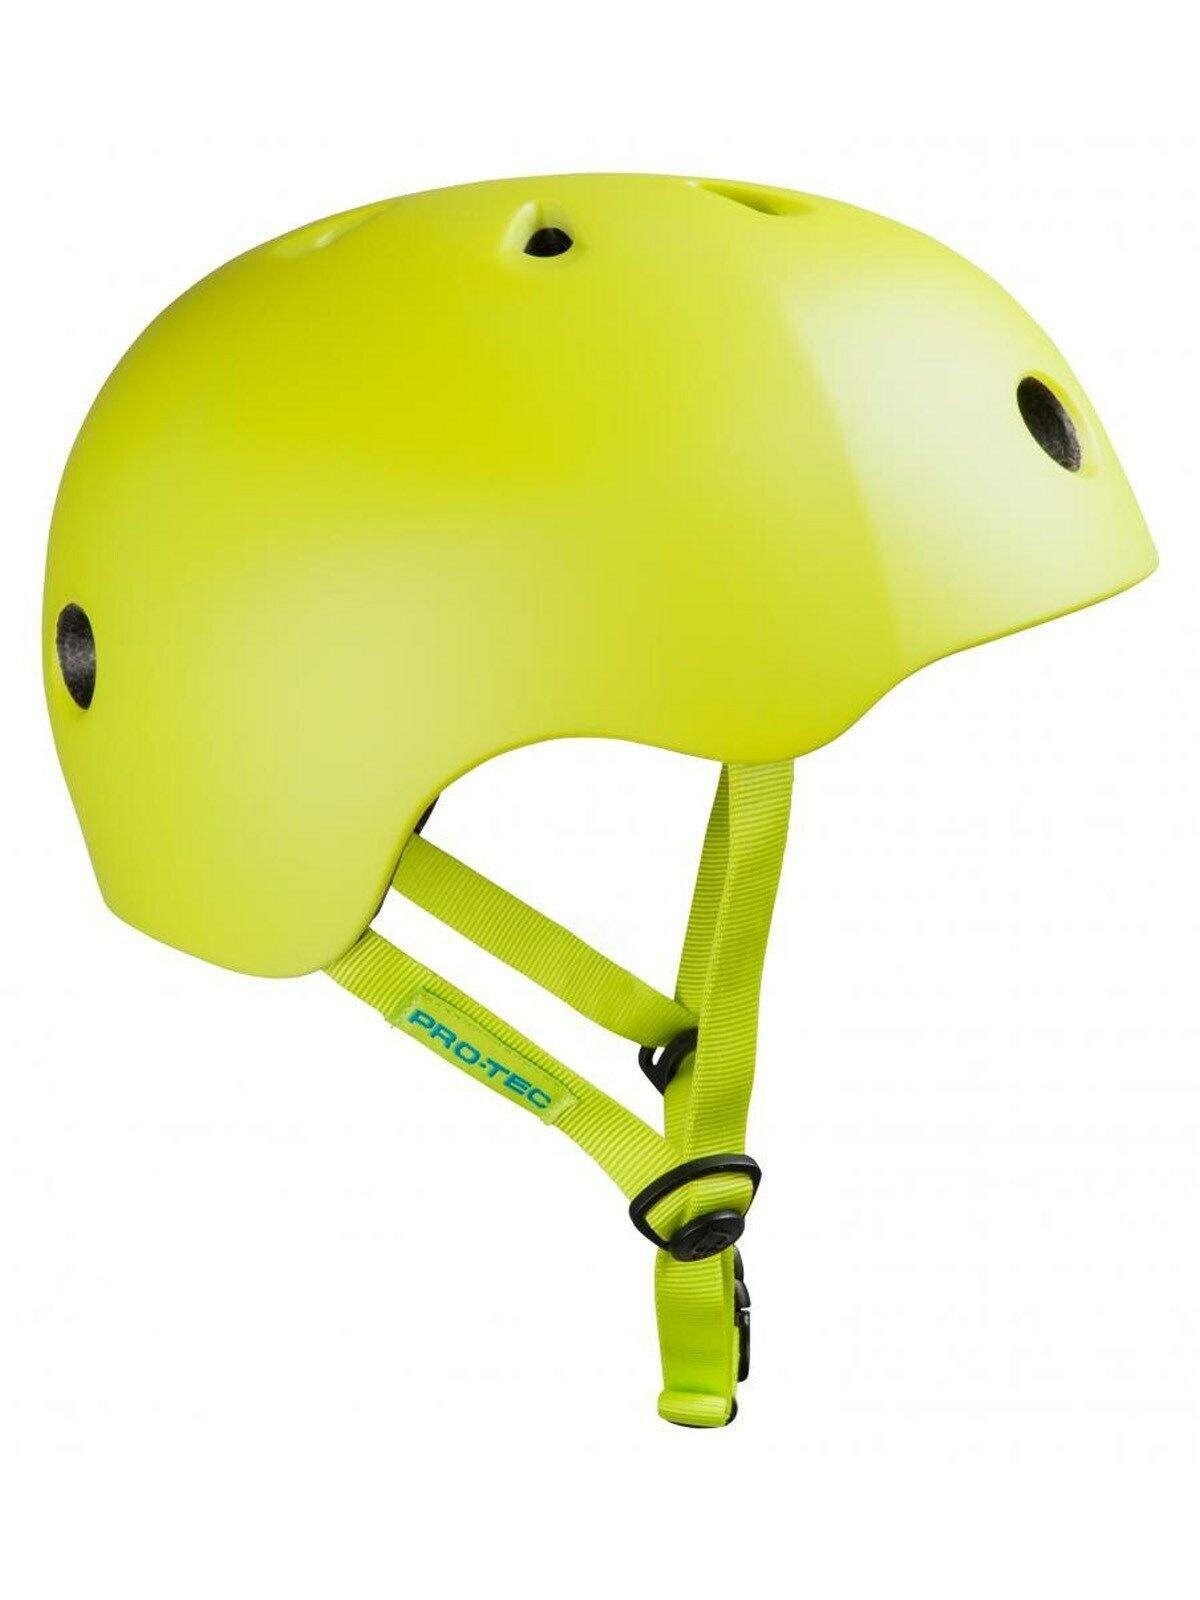 Predec Street Lite Helmet Longboard S board  Scooter  Bike Helmet Satin Citrus  unique shape